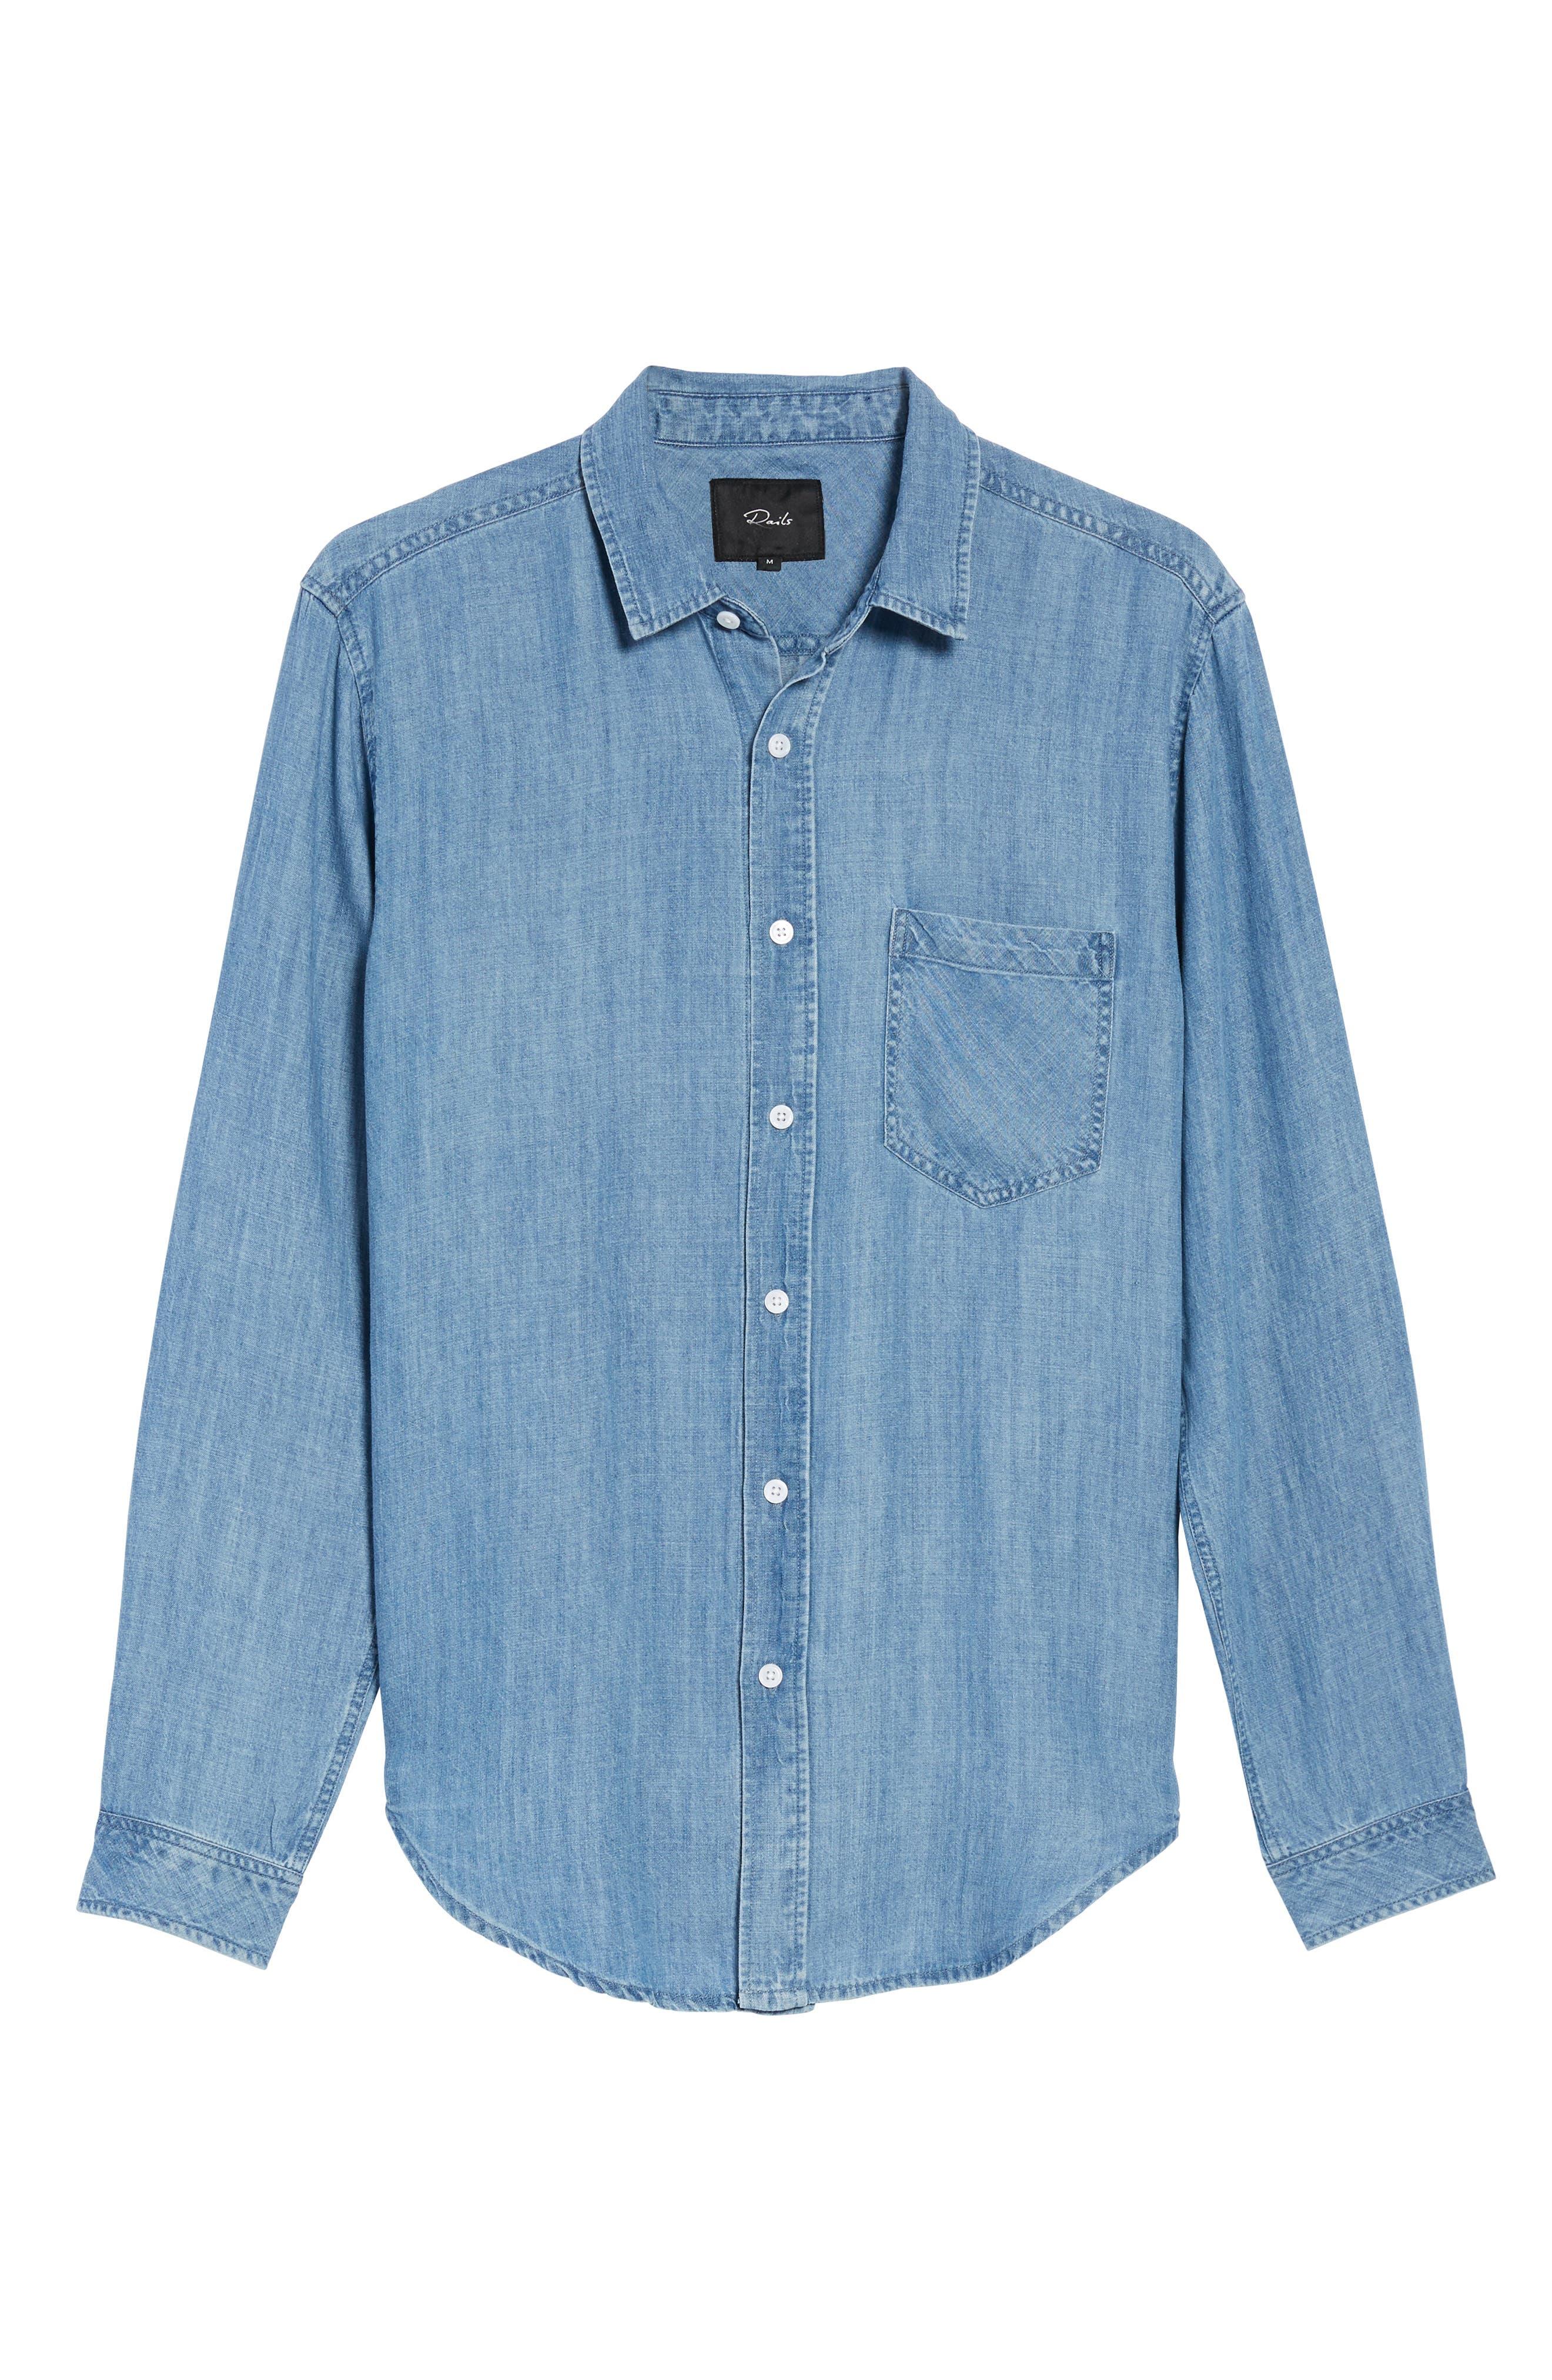 Colton Denim Shirt,                             Alternate thumbnail 6, color,                             MEDIUM VINTAGE WASH